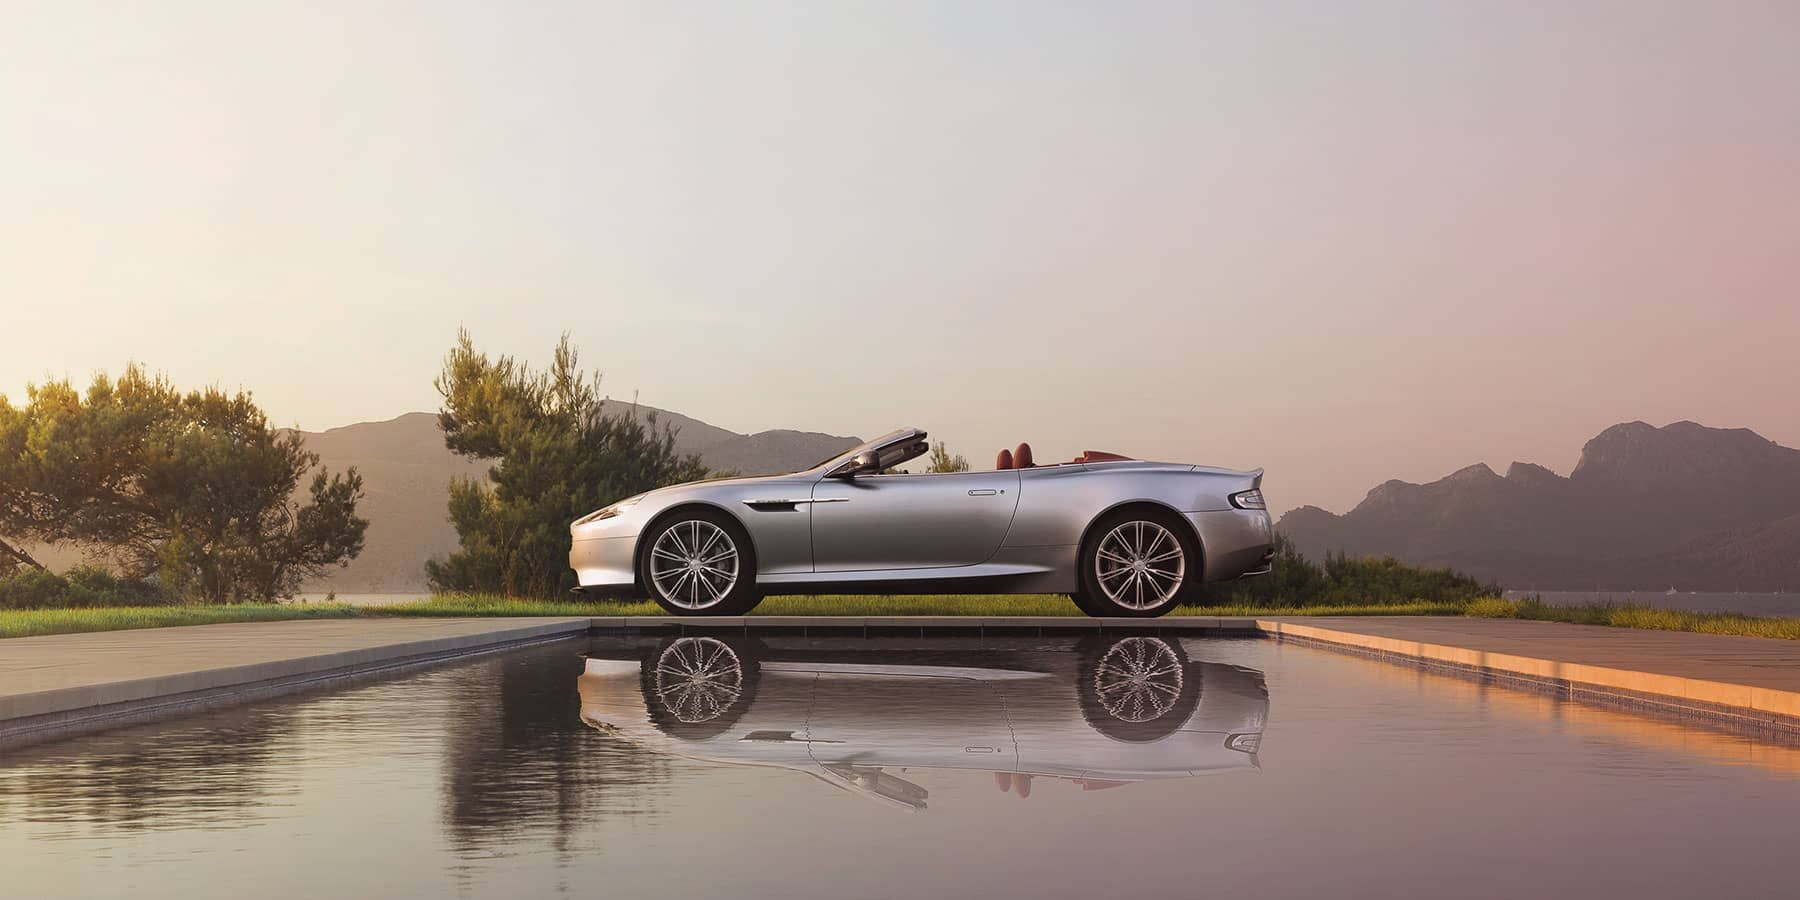 The Elegant Newport Beach Aston Martin For Your Favorite Car - Newport beach aston martin